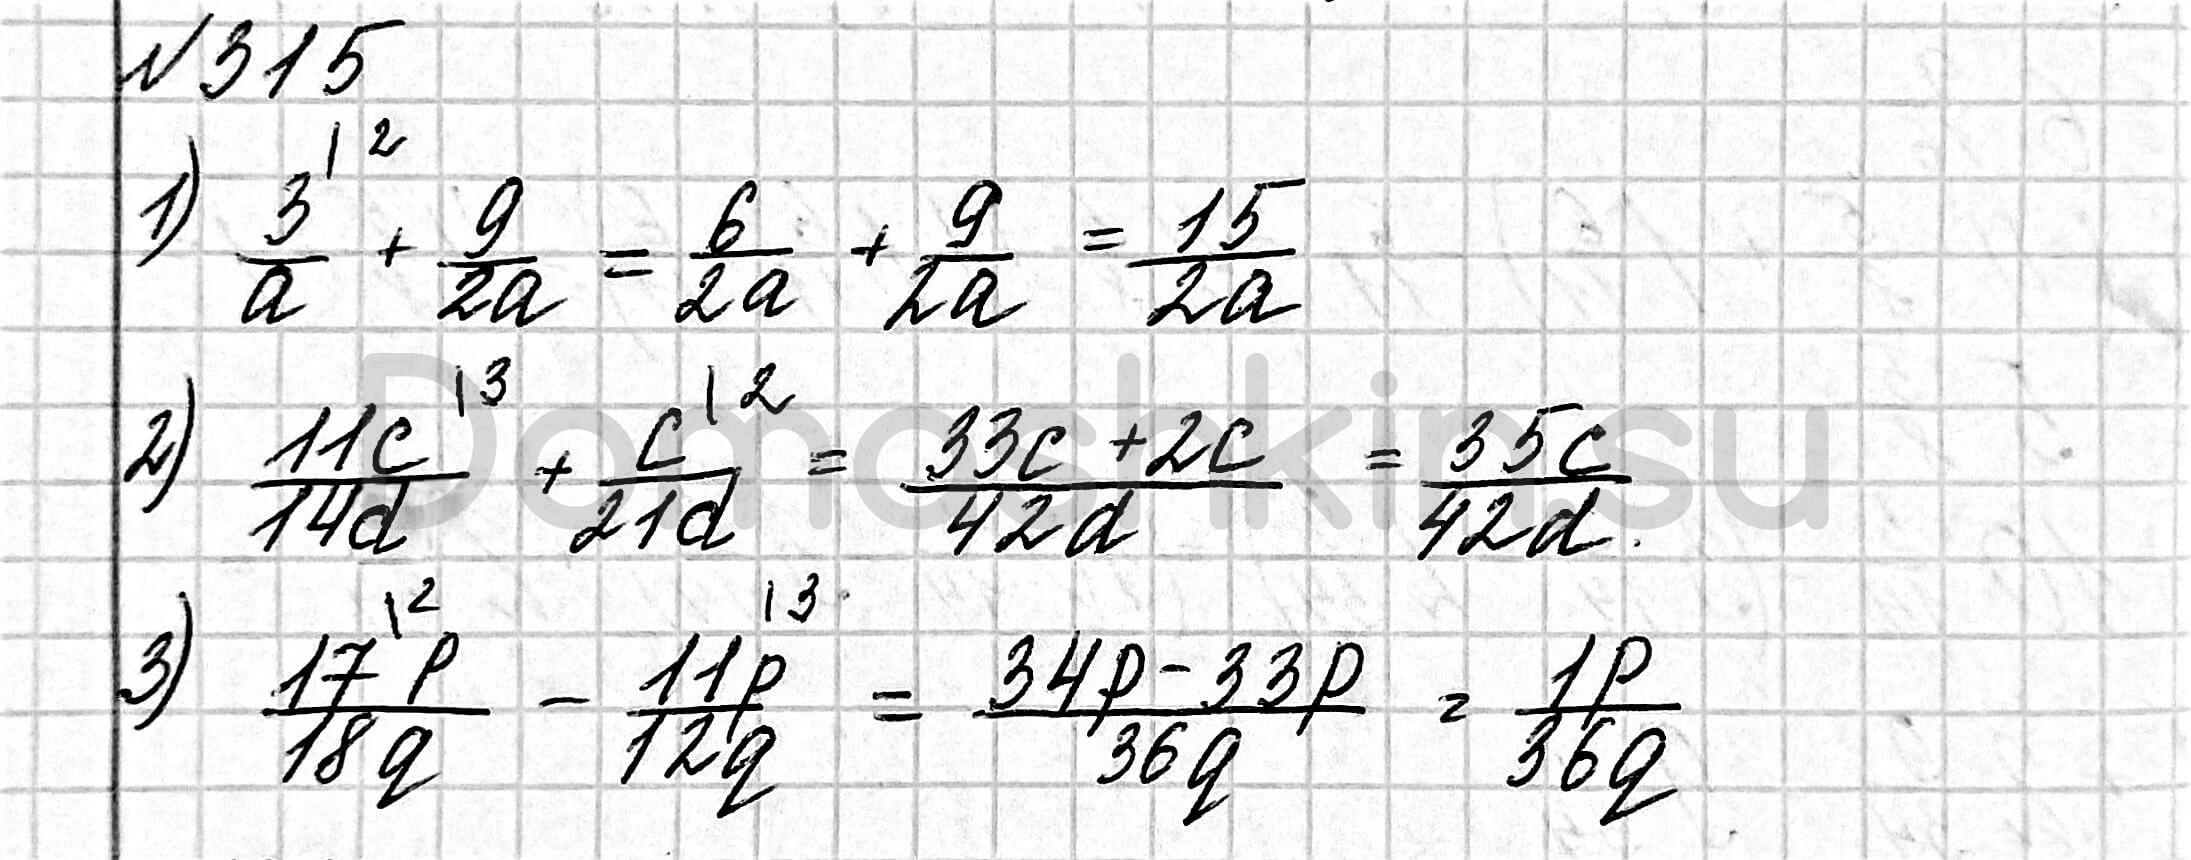 Математика 6 класс учебник Мерзляк номер 315 решение